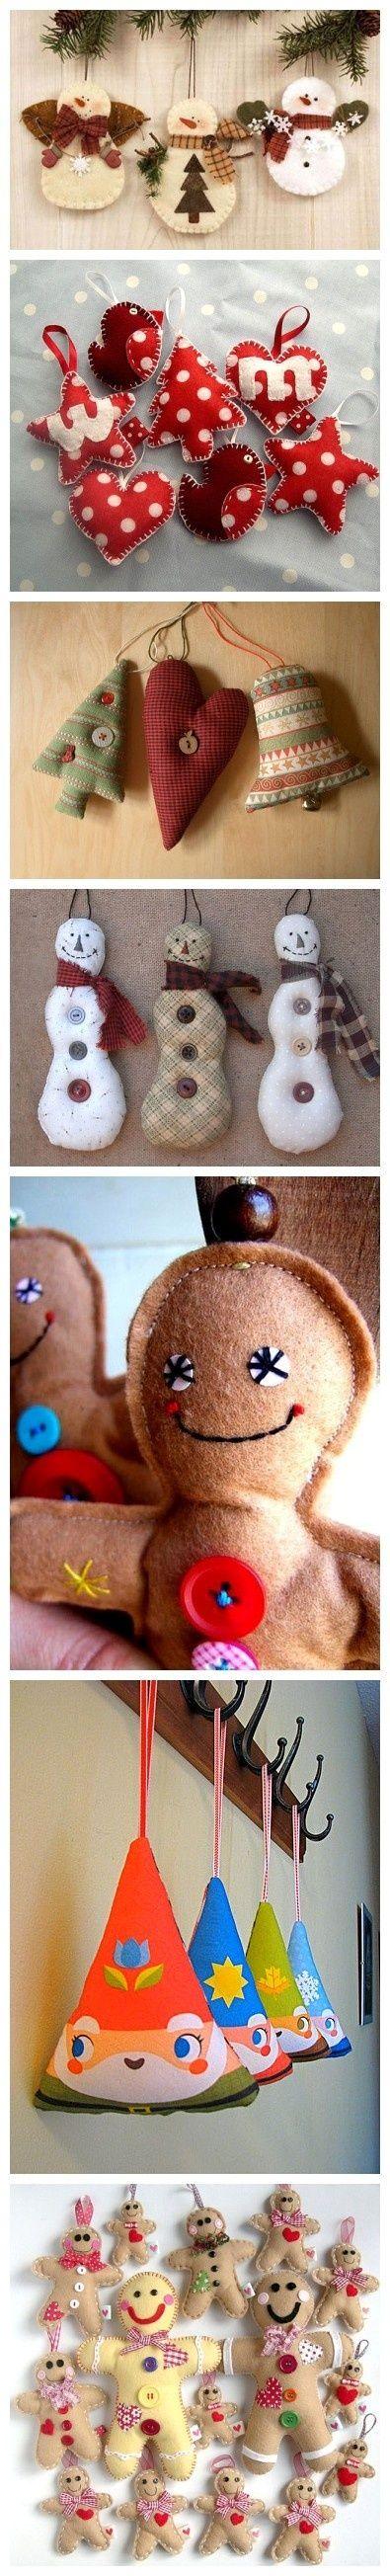 Christmas felt ornaments - so cute!